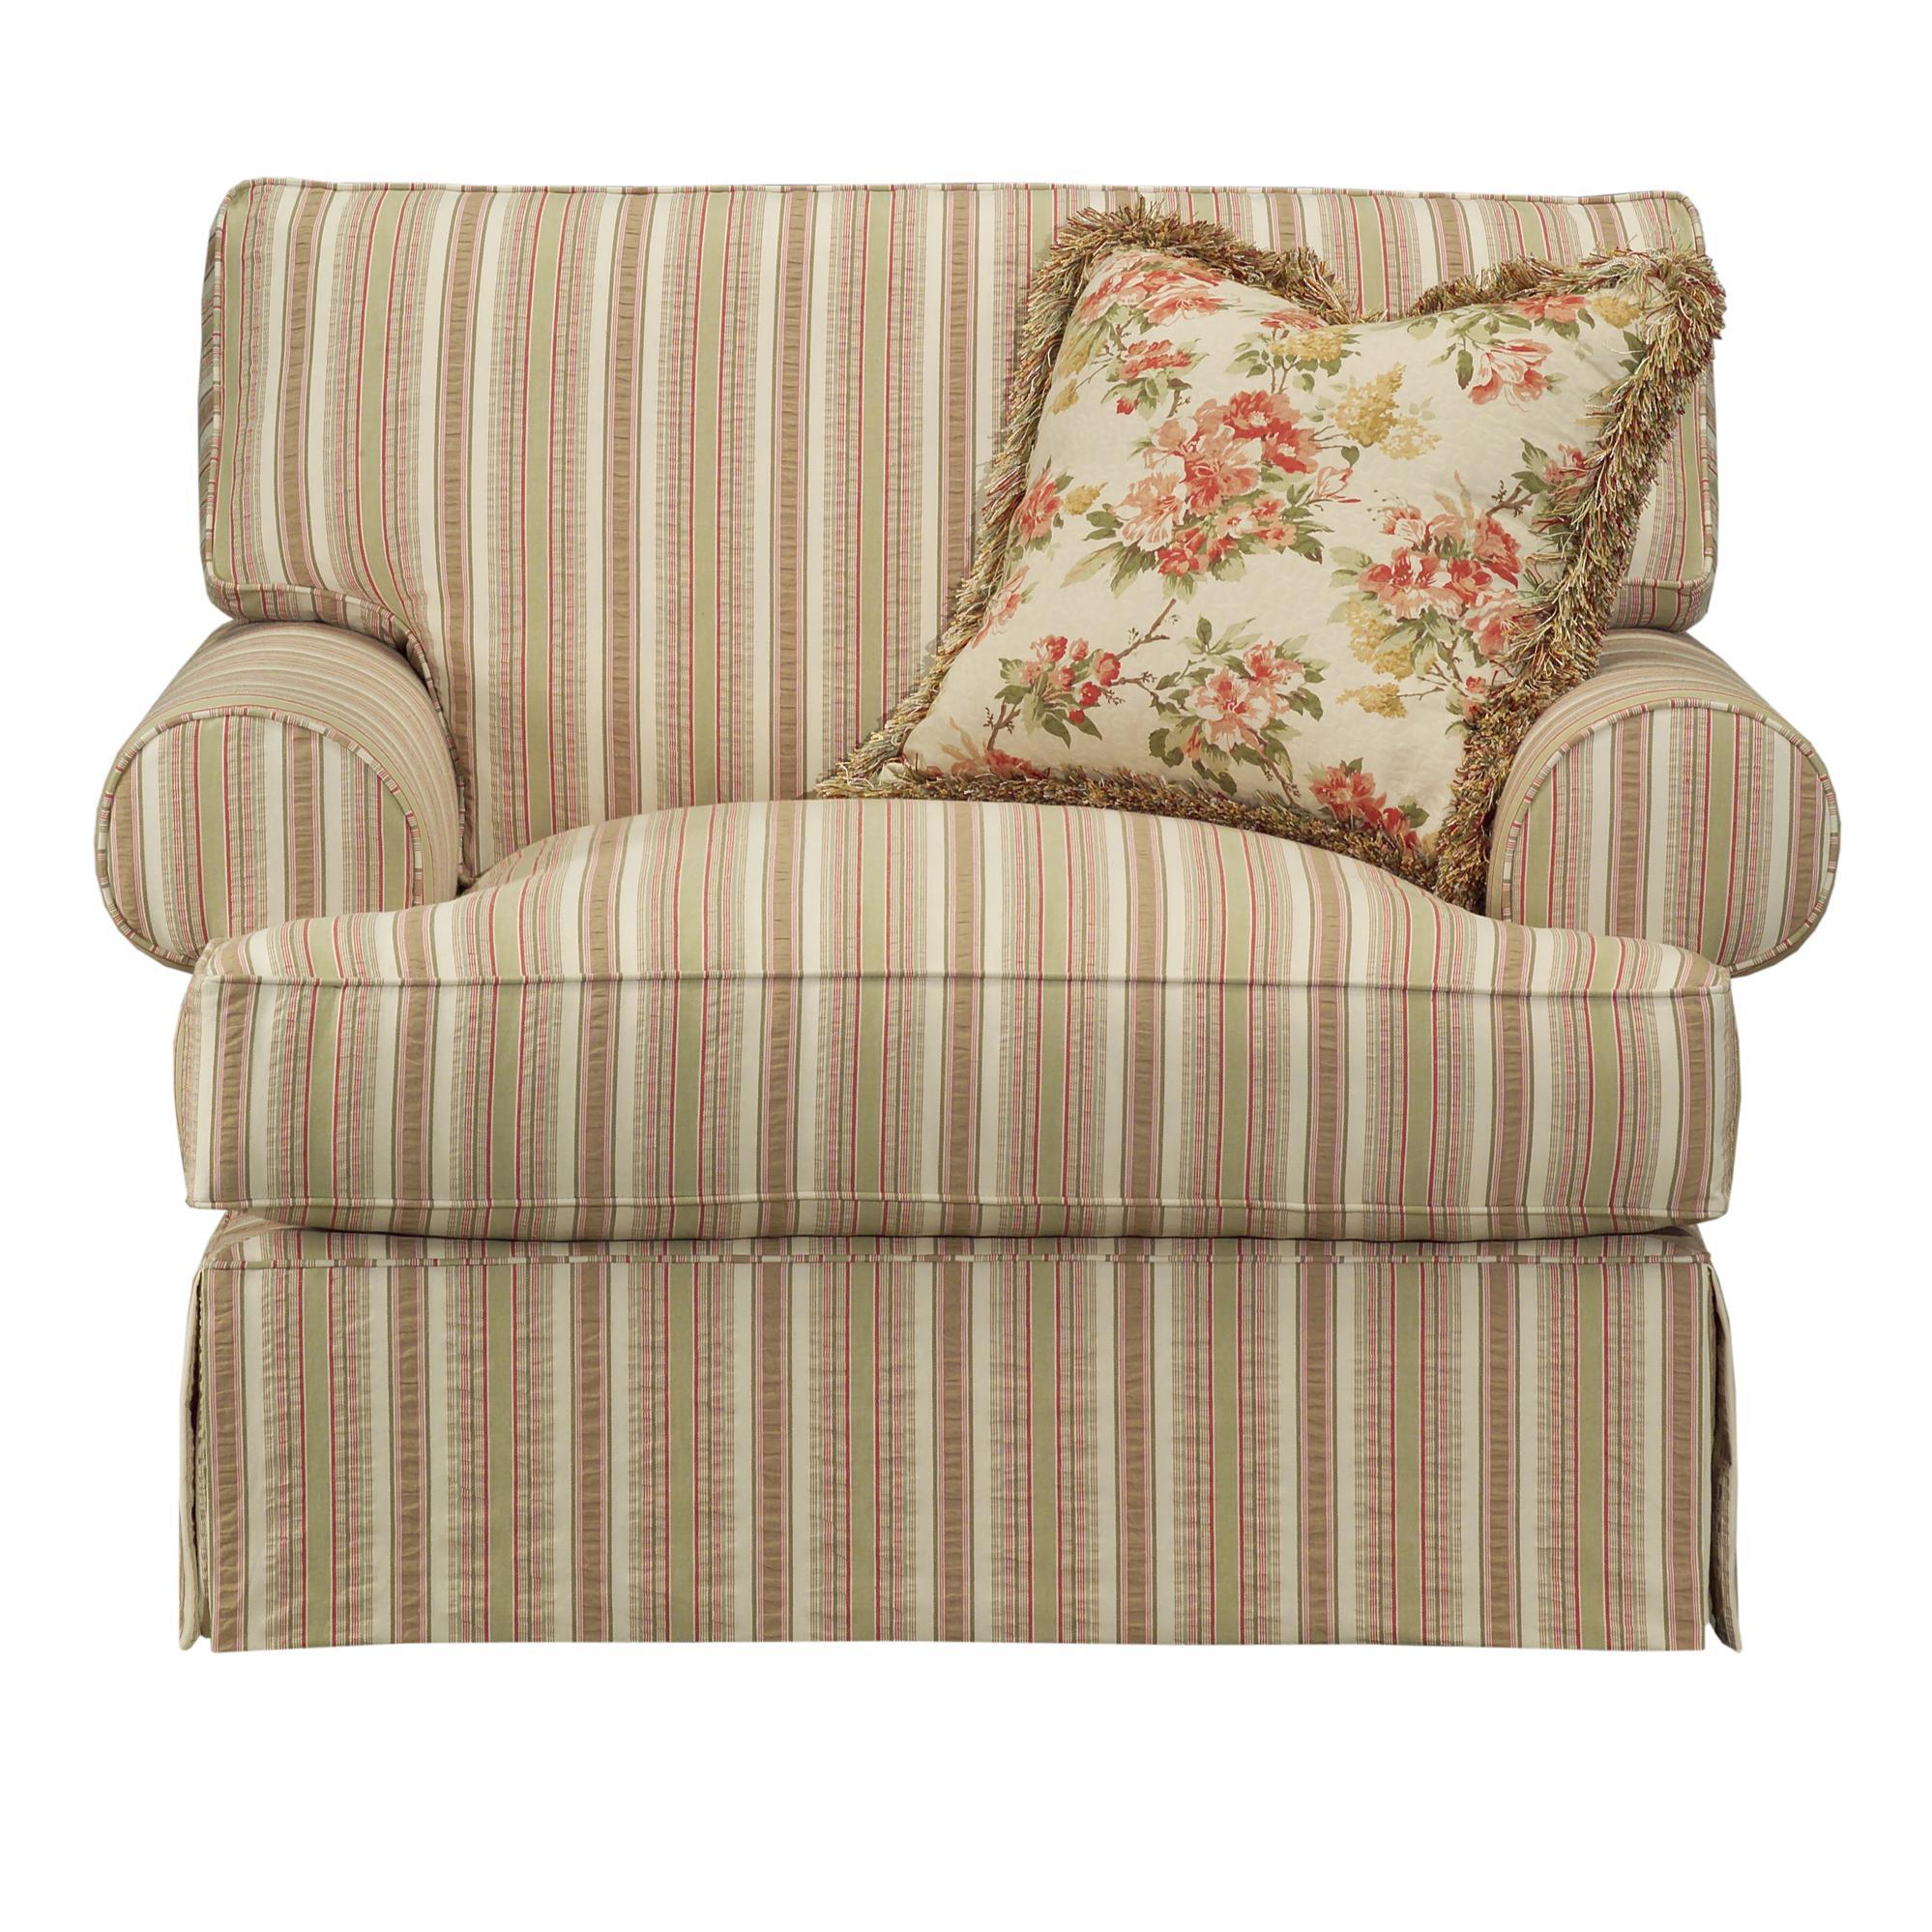 oversized upholstered chair cozzia massage kincaid furniture malibu 802 84 skirted becker